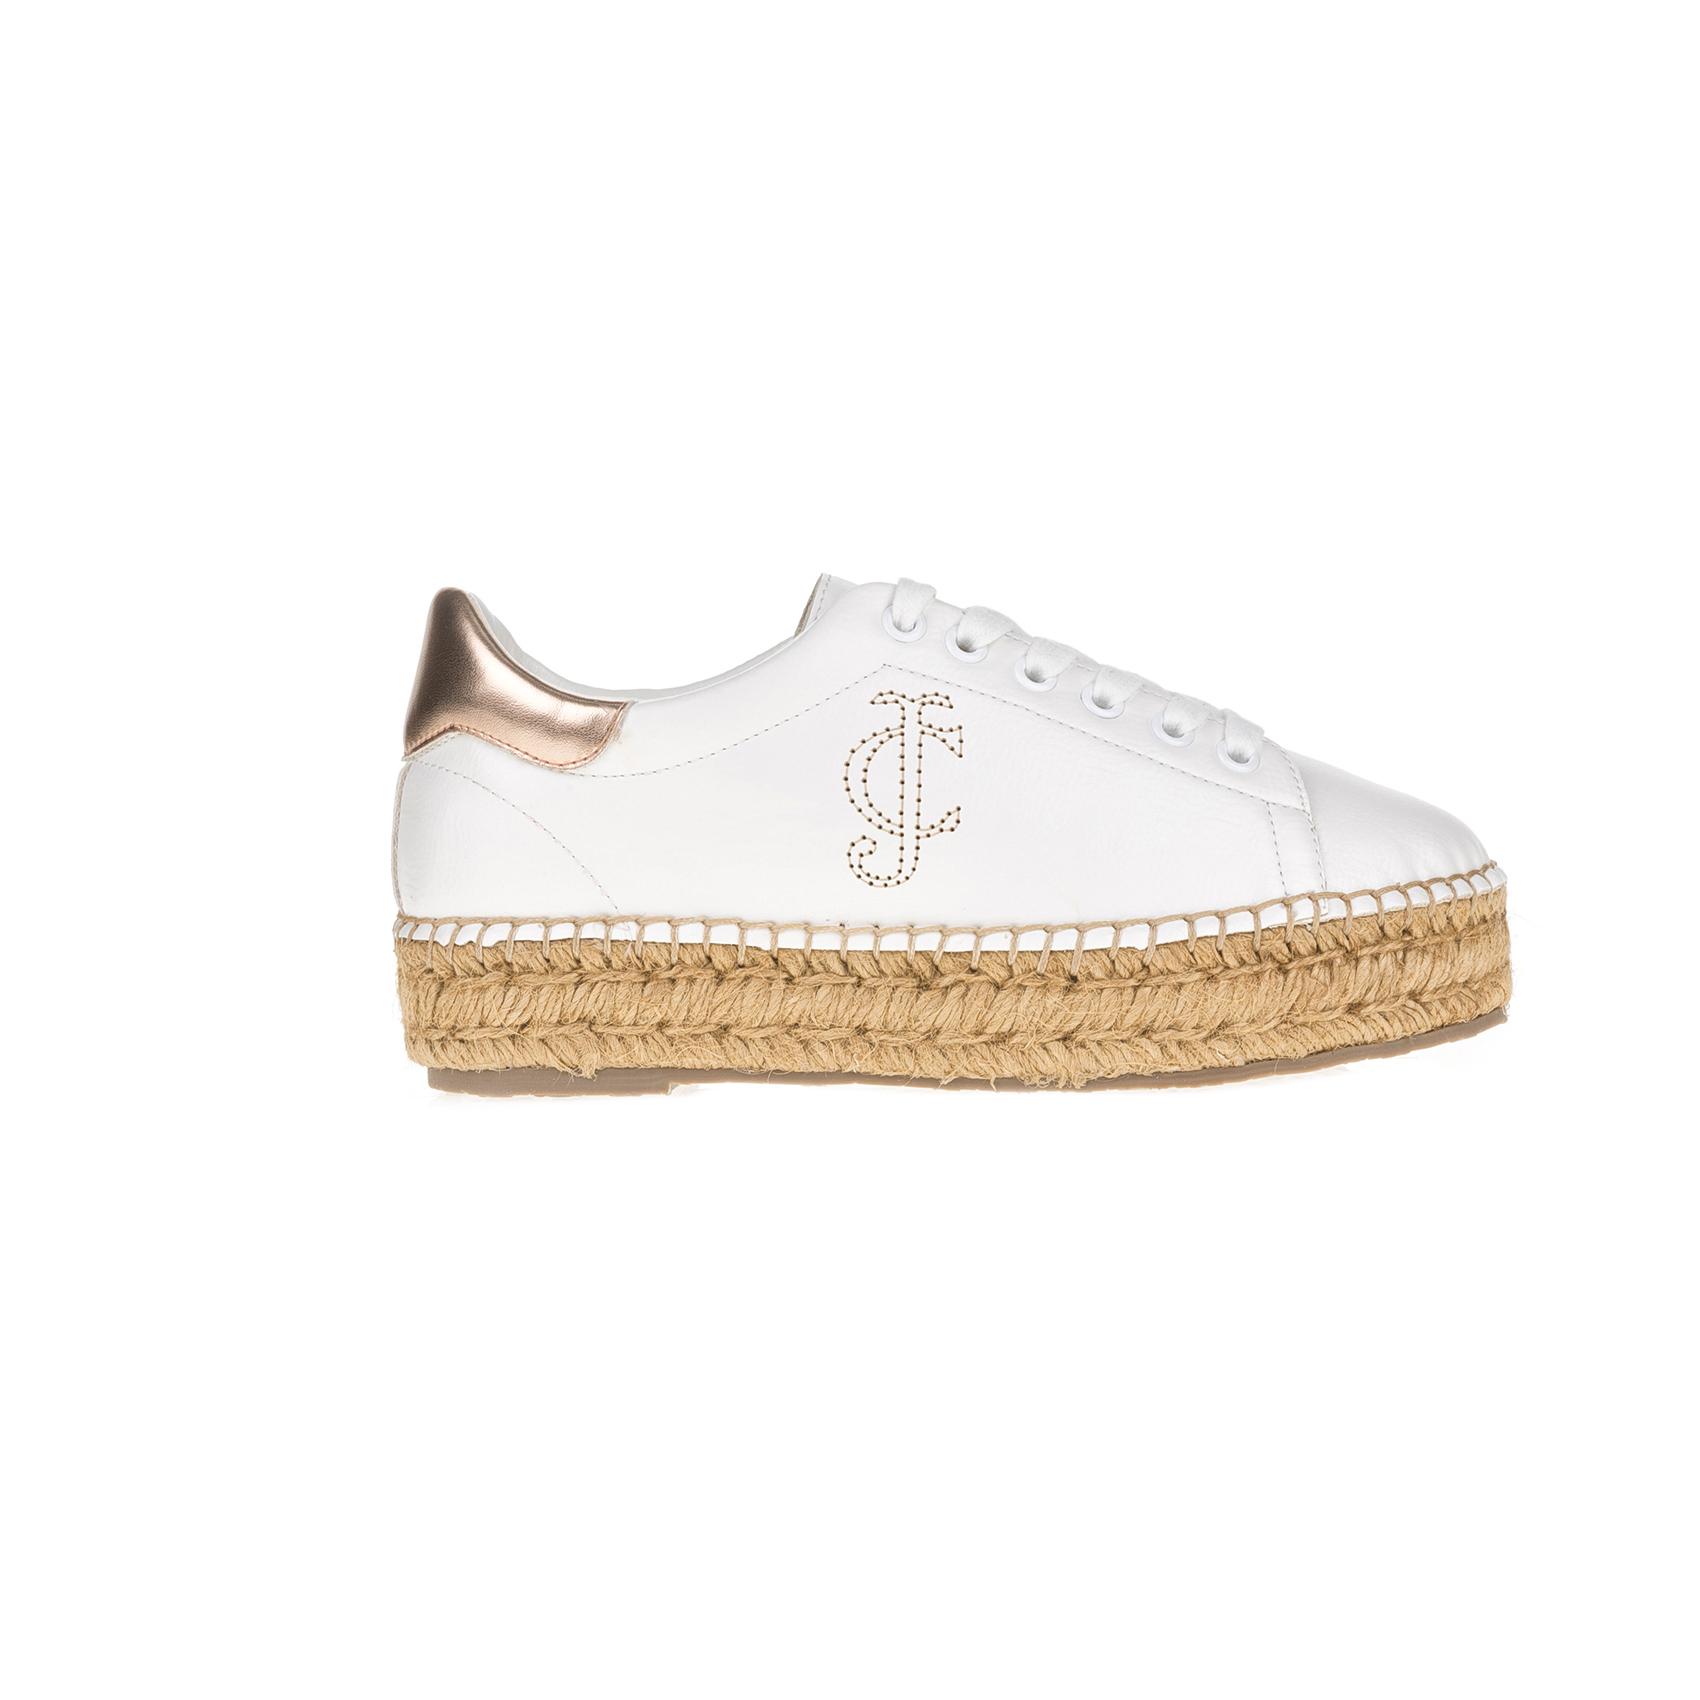 JUICY COUTURE – Γυναικεία παπούτσια JUICY COUTURE PRETTY λευκά